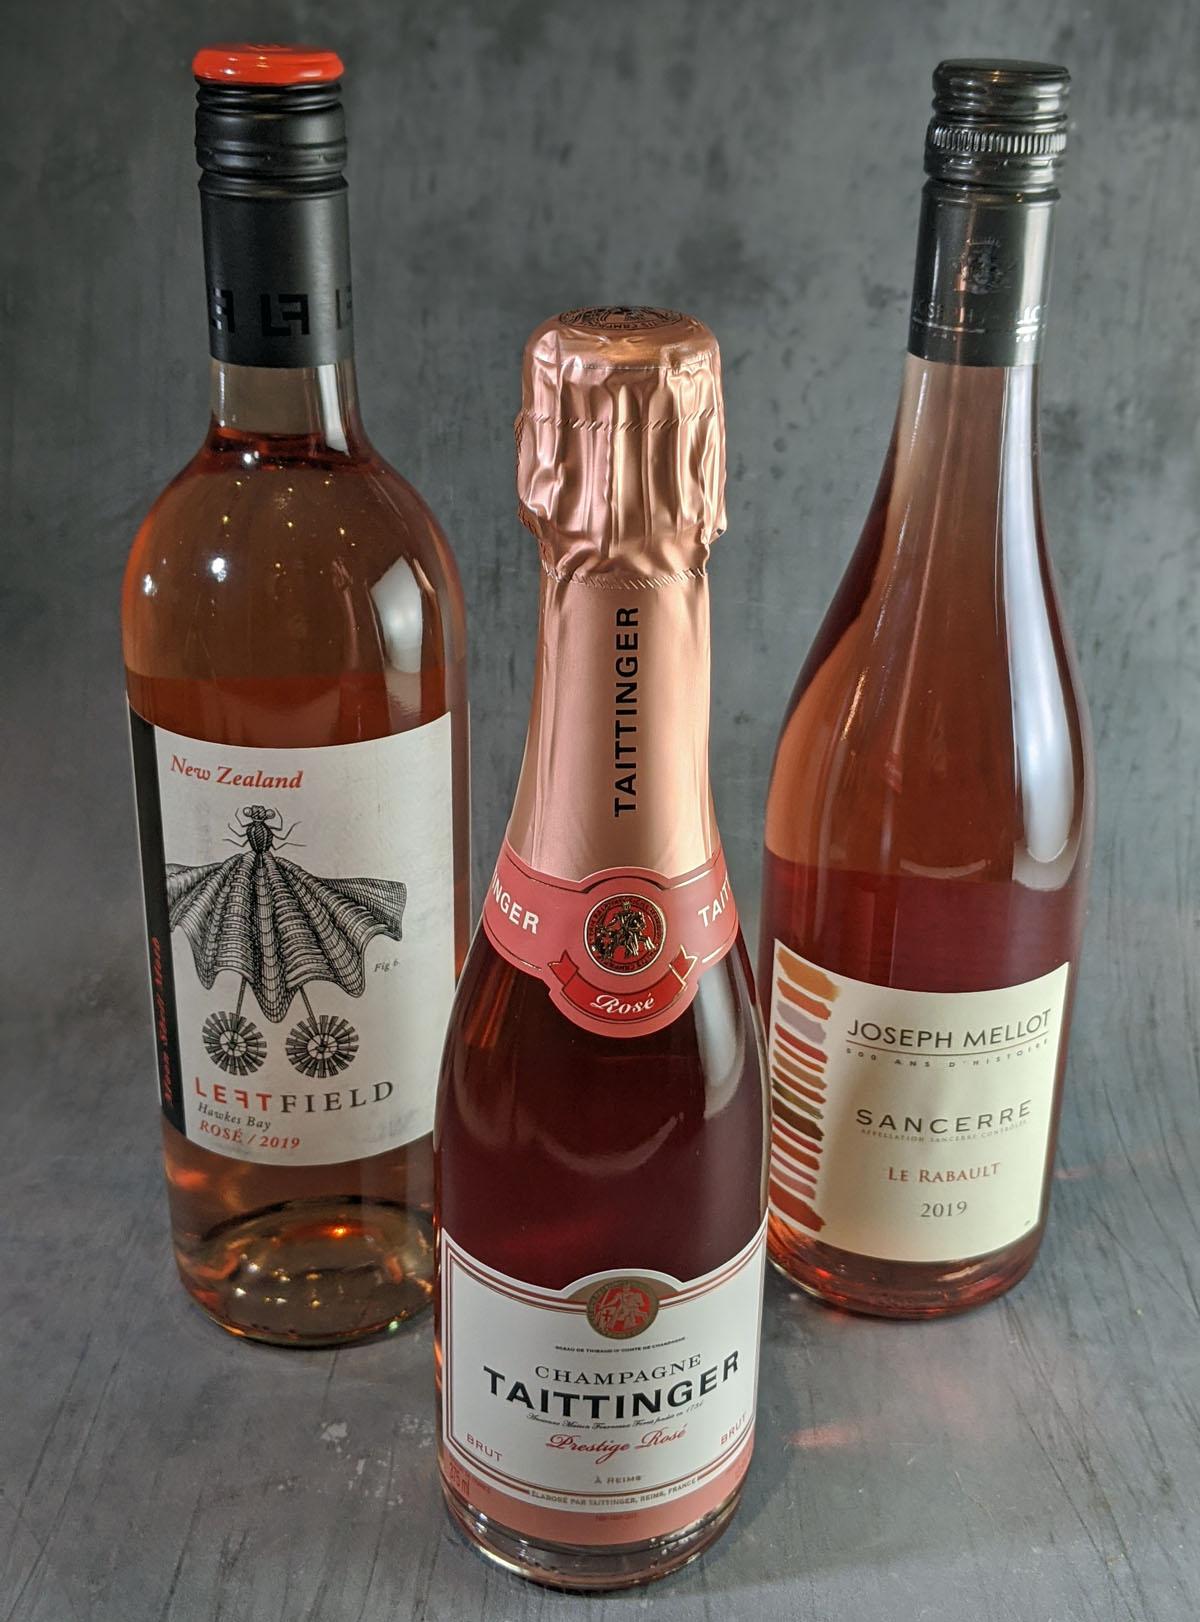 Rosé Wine Pairing Wines - Taittinger, Left Field and Joseph Mellot Sancerre